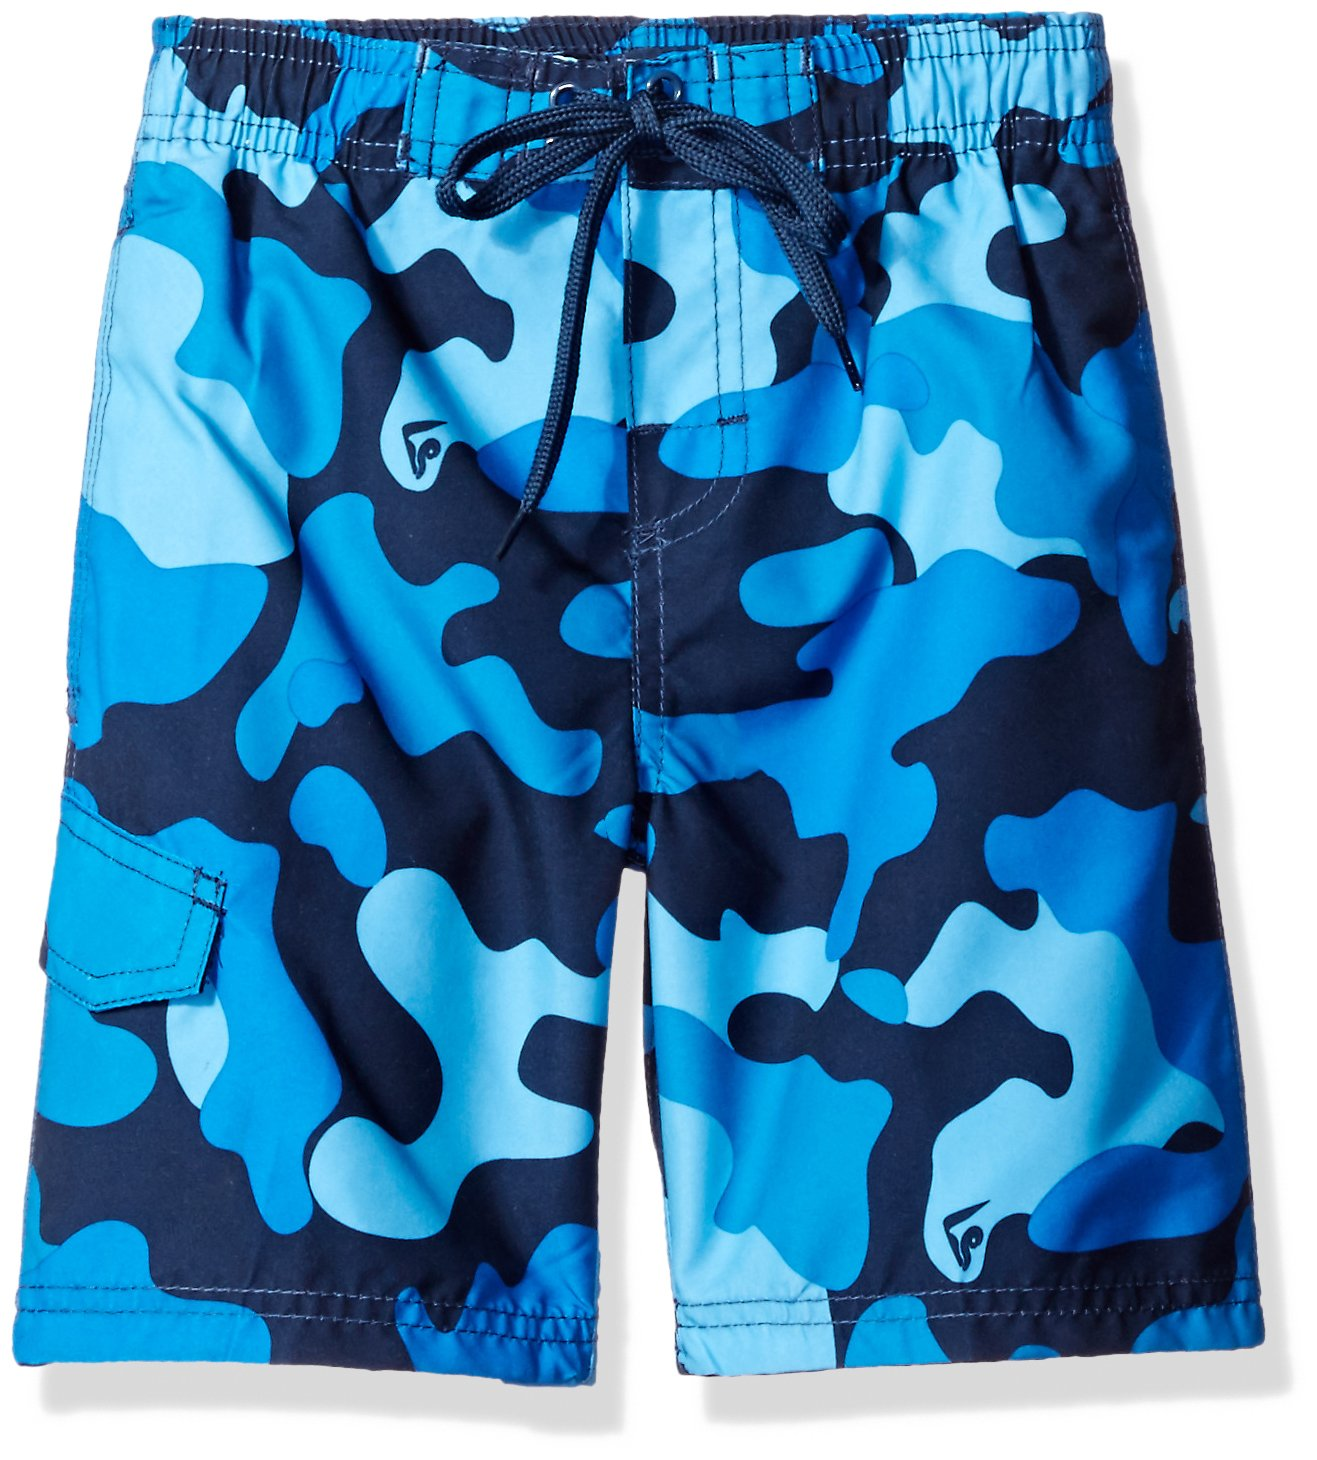 Kanu Surf Little Boys' Camo Swim Trunk, Navy, Medium (5/6)